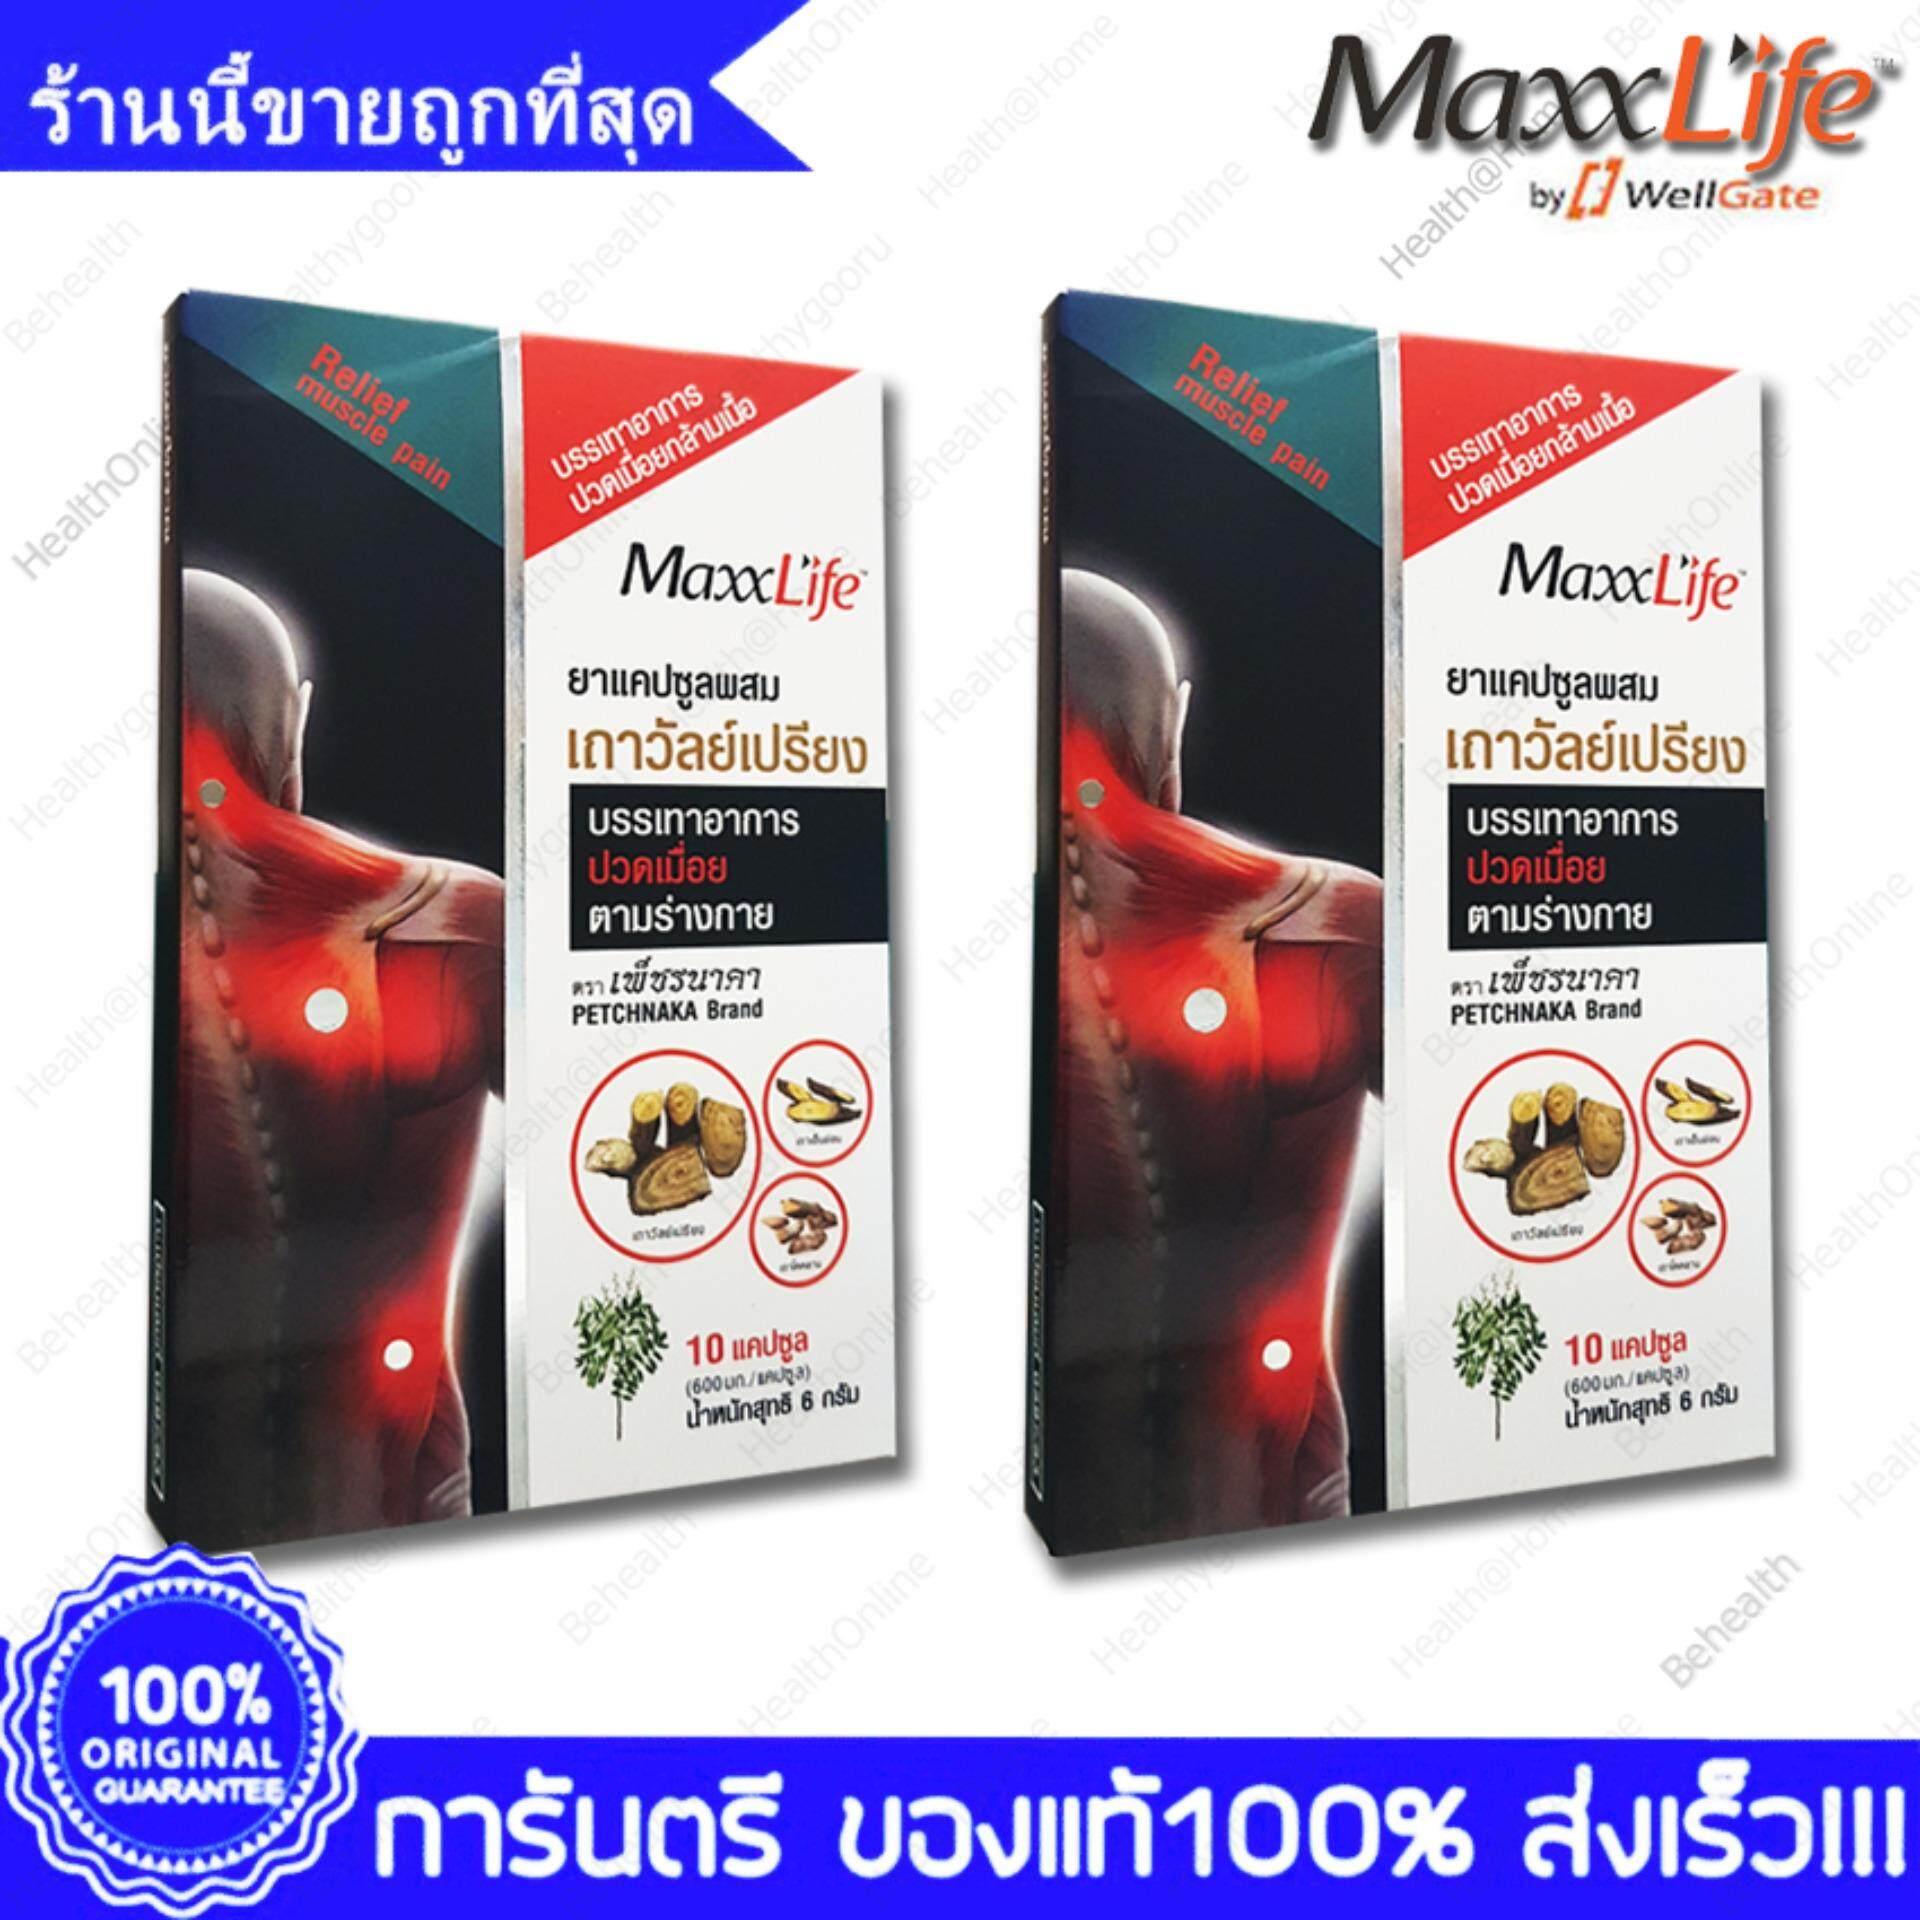 Maxxlife Petchnaka Derris Scandens เถาวัลย์เปรียง ตรา เพชรนาคา ปวดเมื่อยตามร่างกาย 10 แคปซูล(capsules) X 2 กล่อง(boxs) By Health@home.